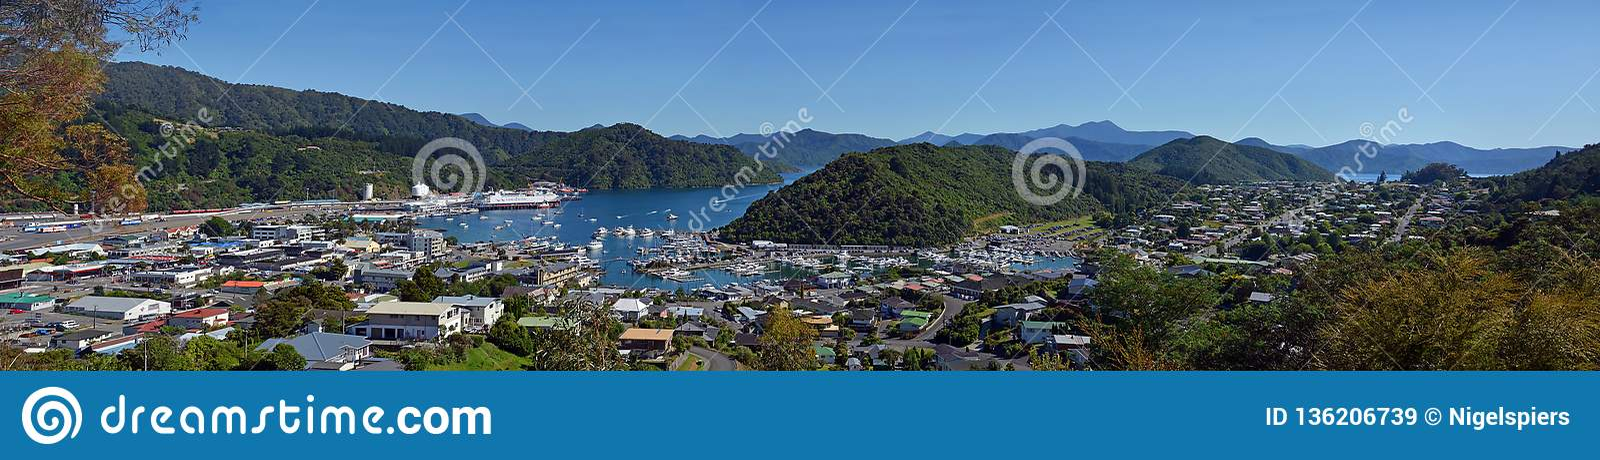 Panorama da rainha Charlotte Sound, do Picton & do Waikawa, Nova Zelândia